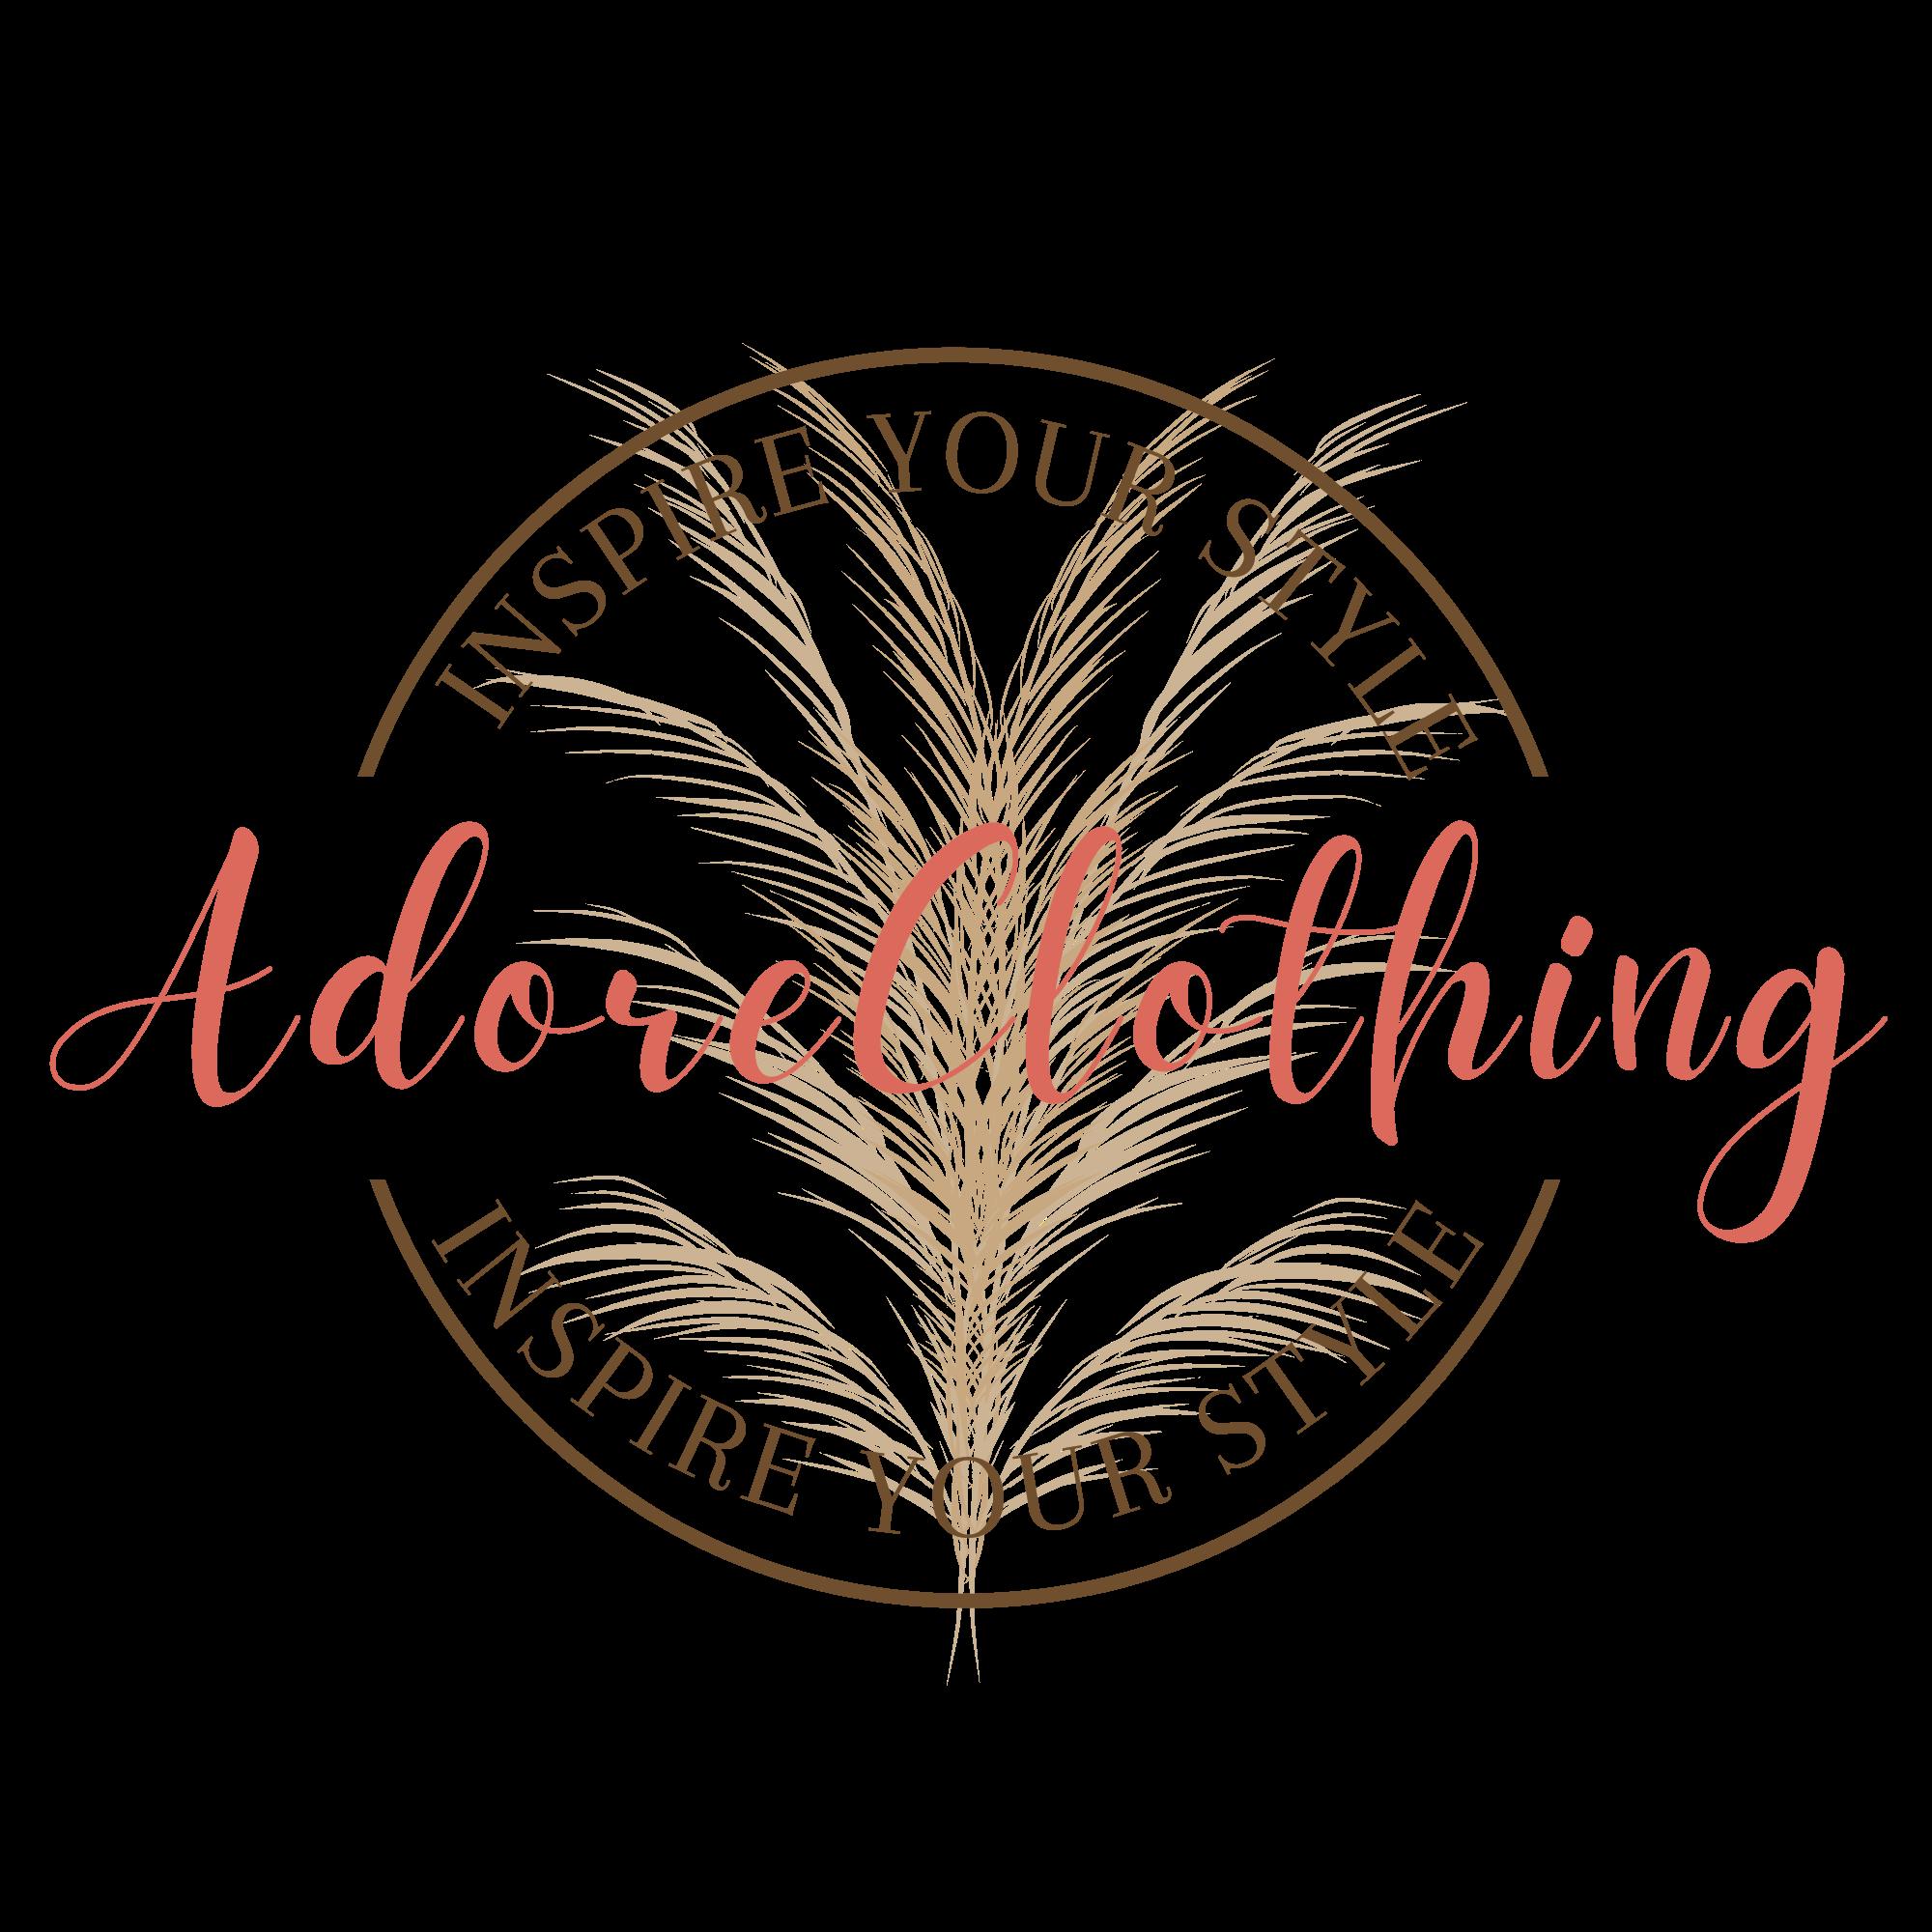 ADORE CLOTHING